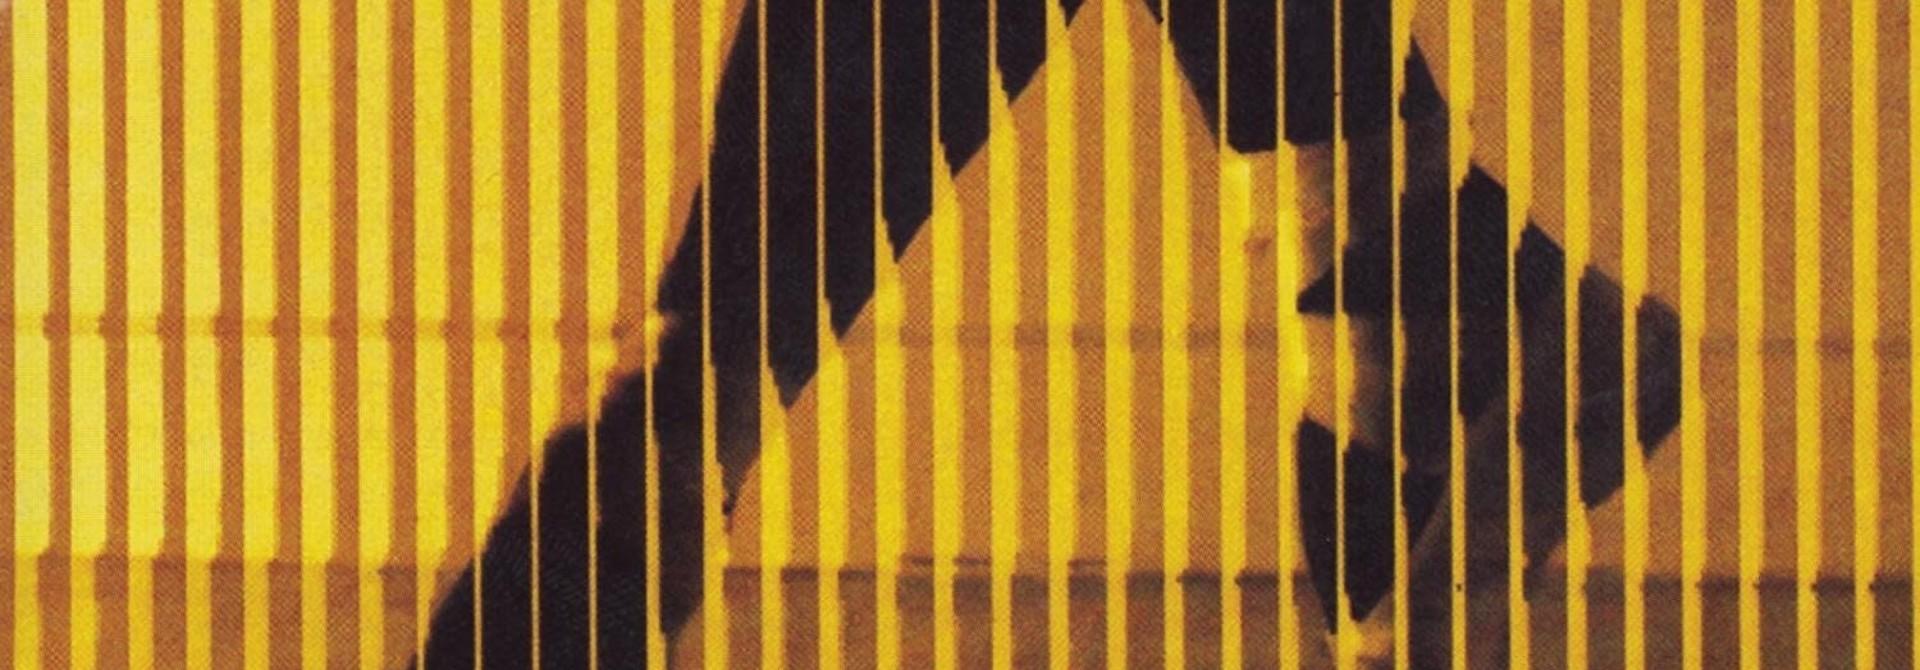 Philip Glass • Dancepieces (180g)